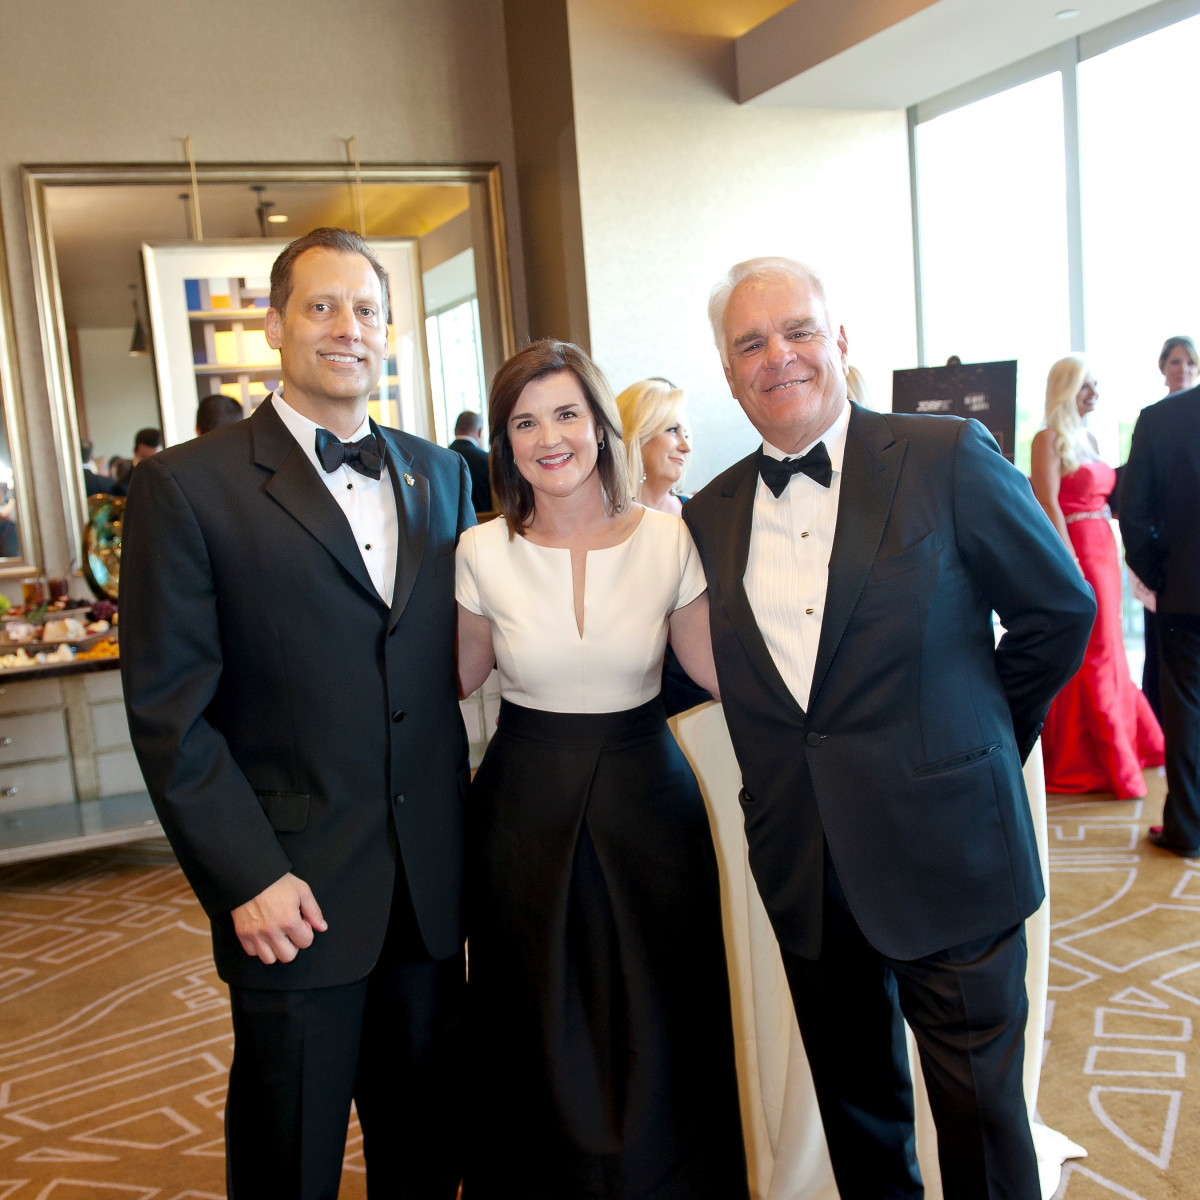 Scott Paul, Amy Camp and Jim Lites